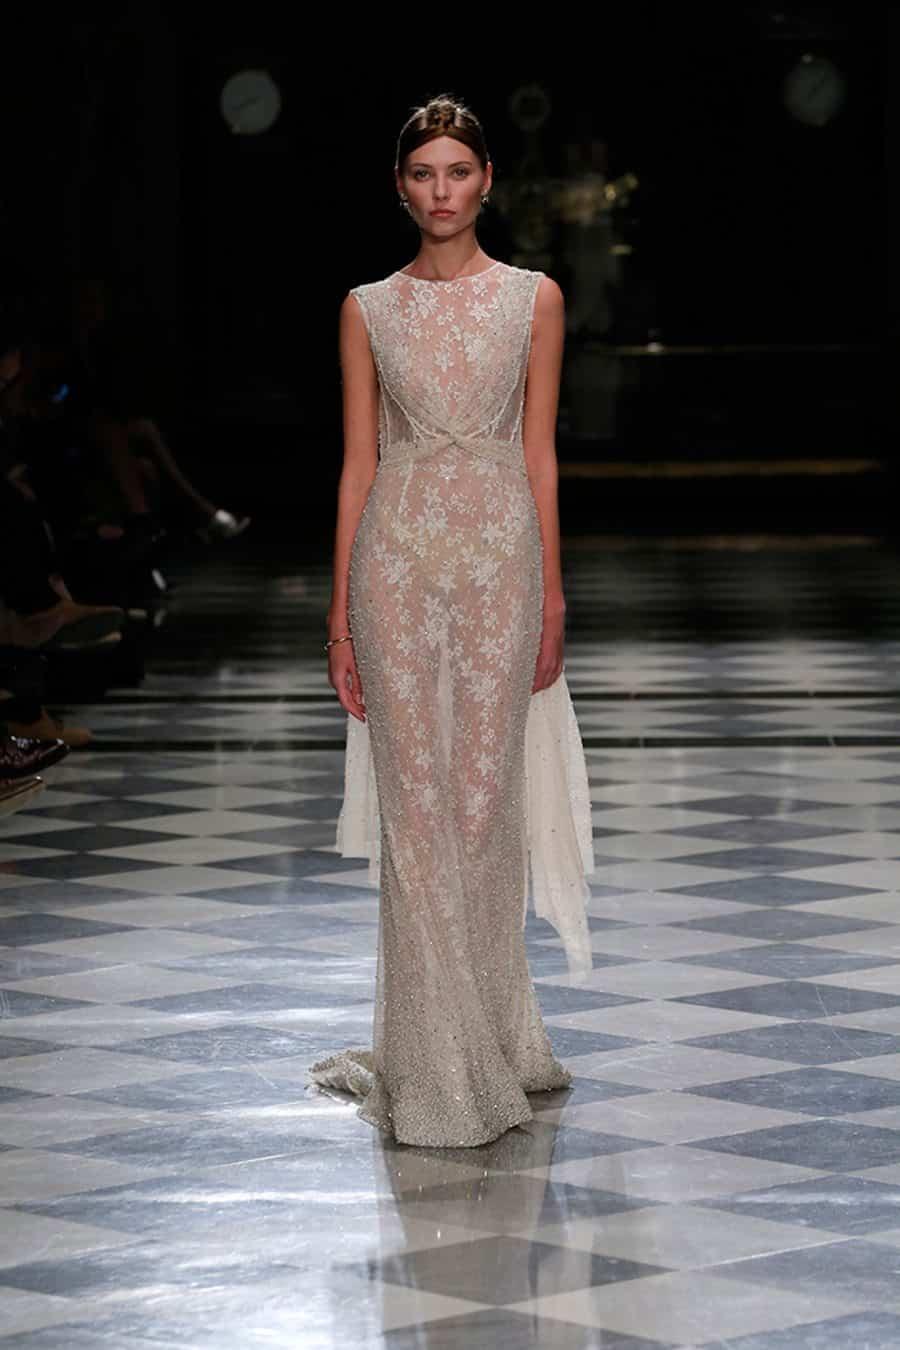 bride-high-fashion-couture-weddingdress-wedding-bridedress-couturedress-highfashion-yolancris-85